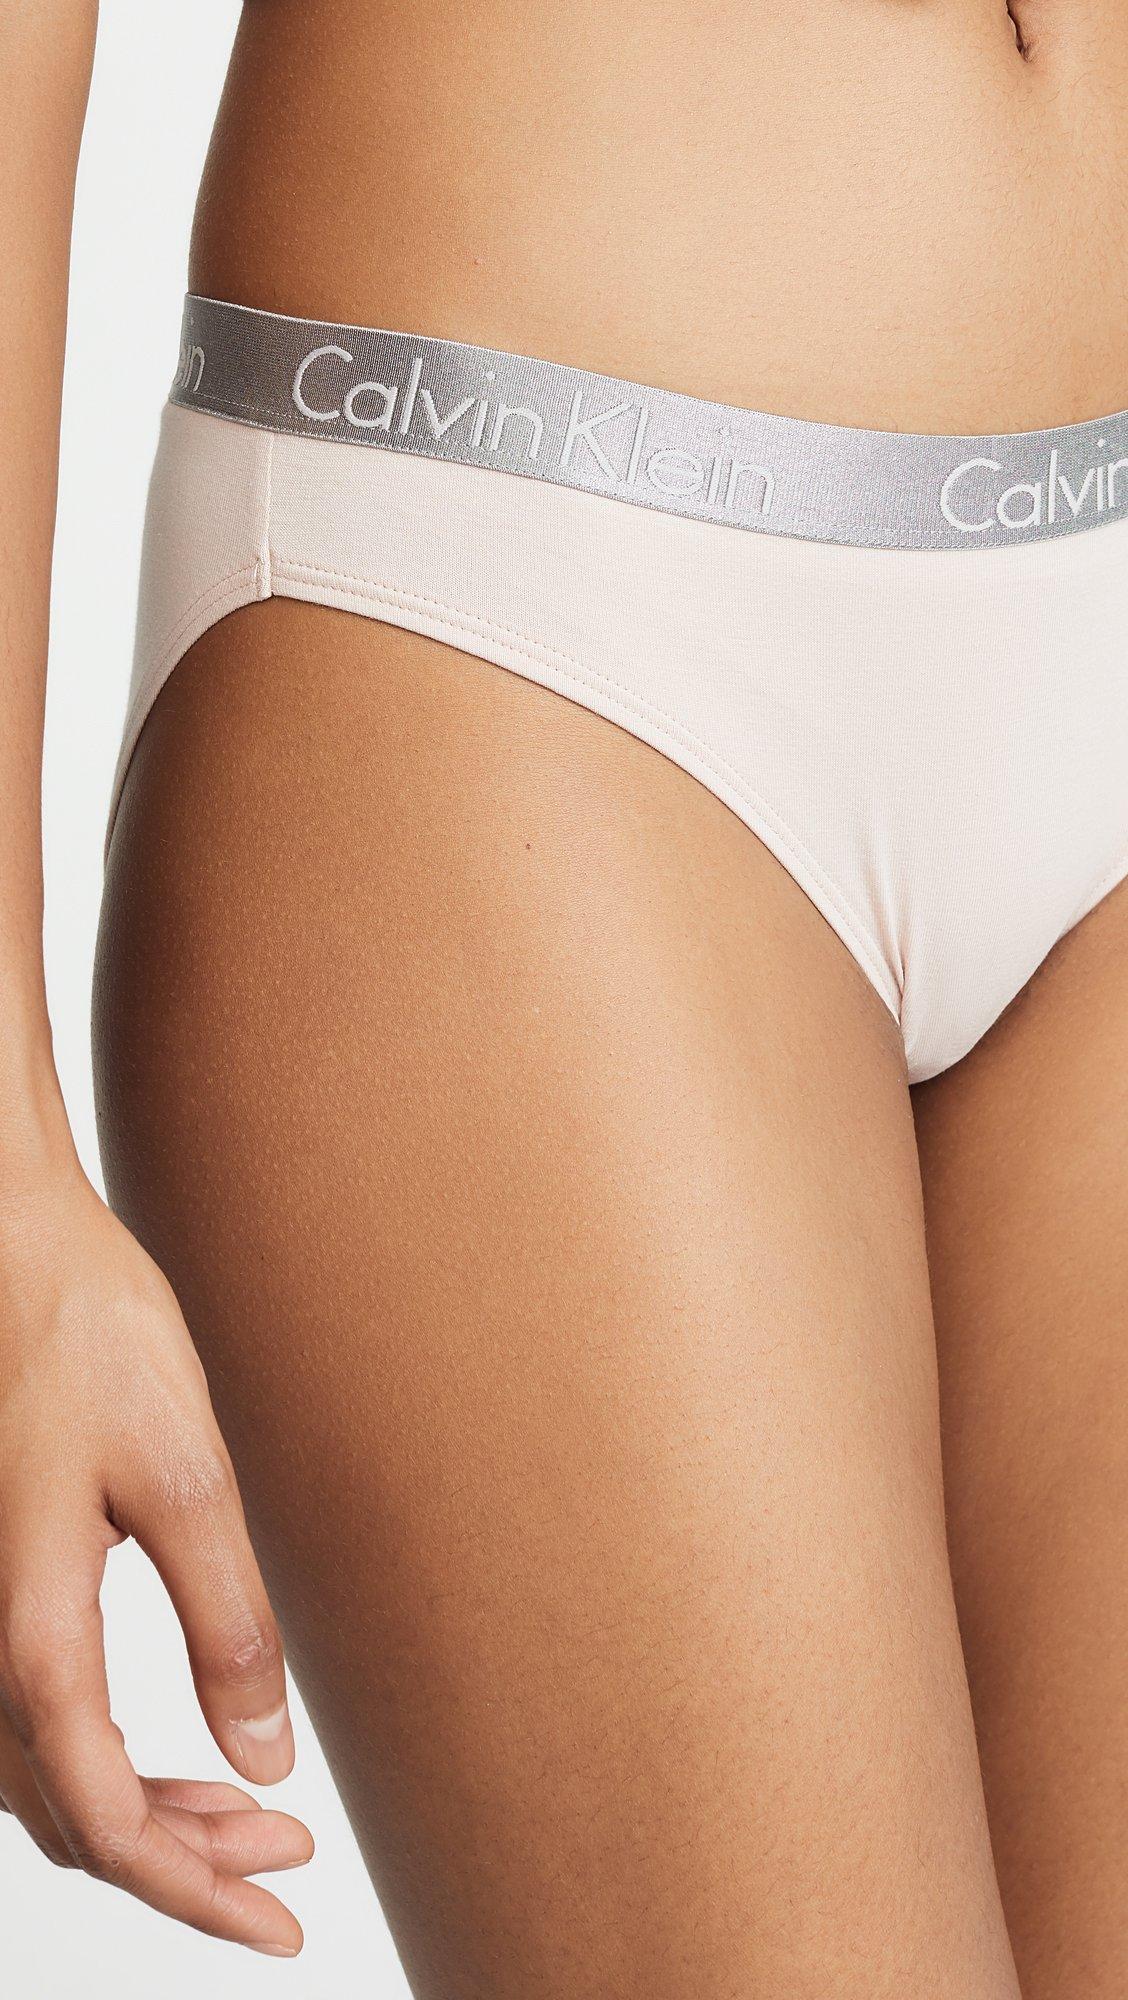 Calvin Klein Women's Radiant Cotton Bikini Panty, Sheer Blush/White/ Simmer Green, X-Small by Calvin Klein (Image #6)